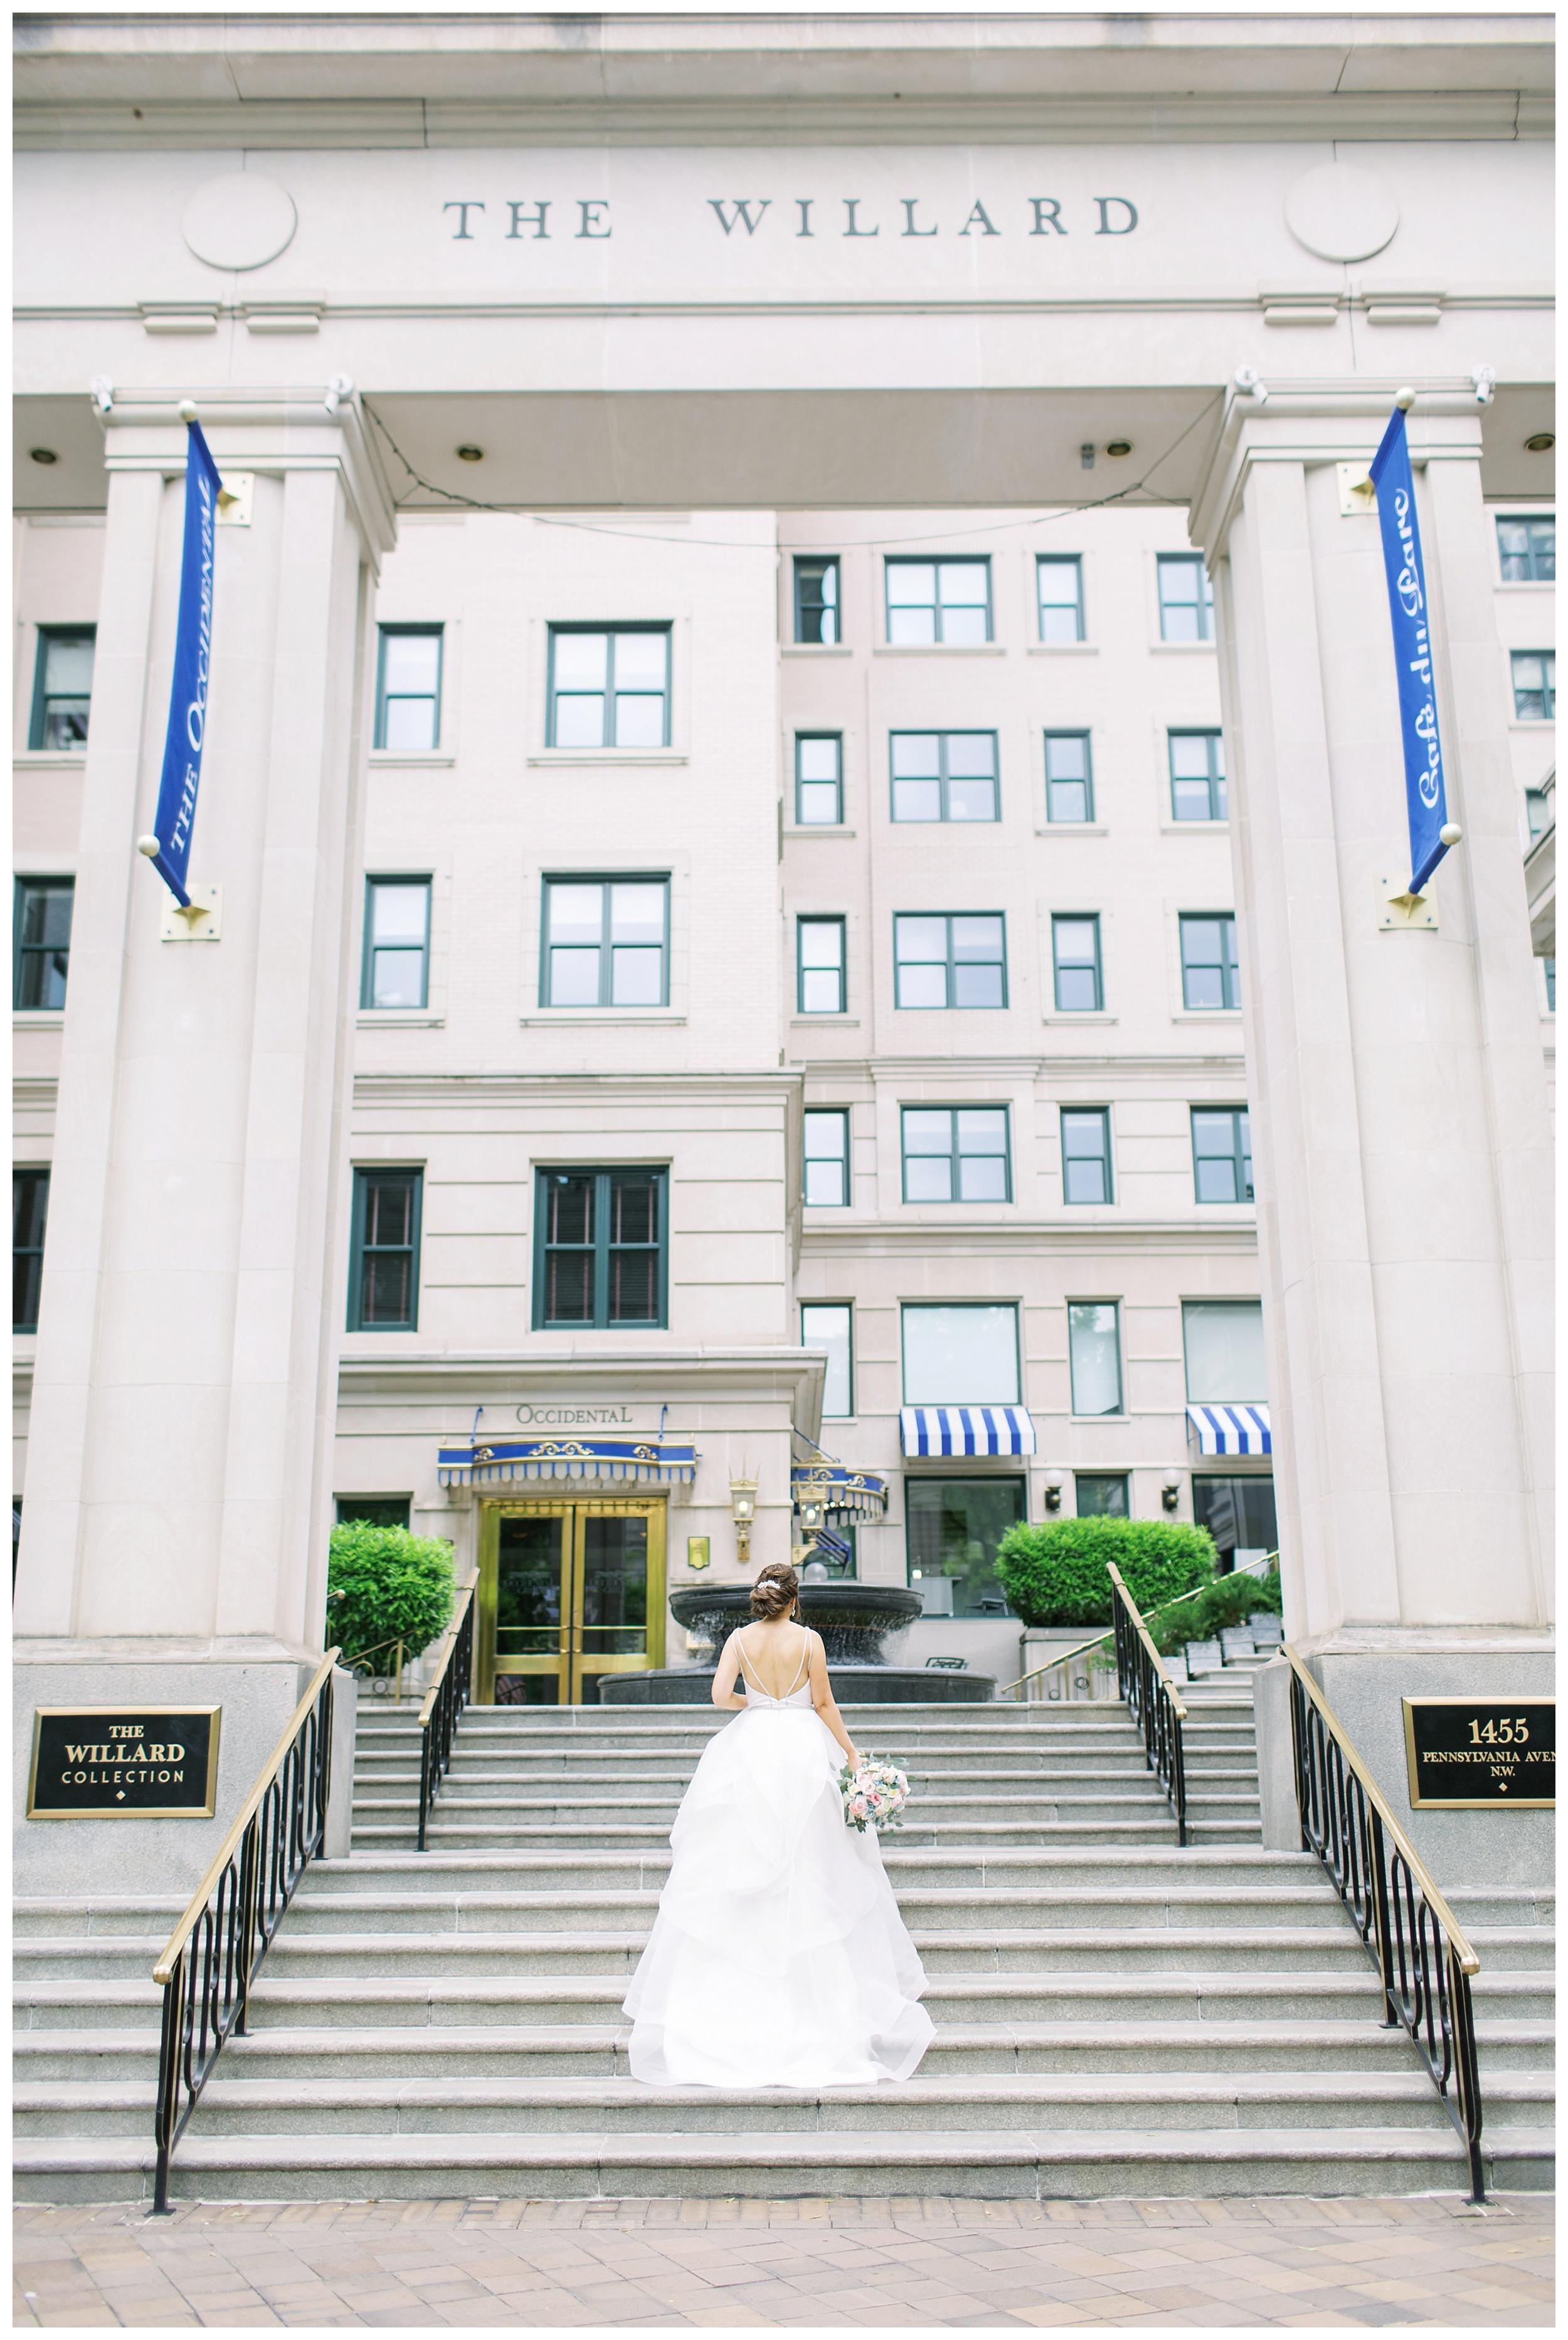 DAR Constitution Hall Wedding Wedding | Daughters of the American Revolution Wedding | District of Columbia Film Wedding Photographer Kir Tuben_0033.jpg